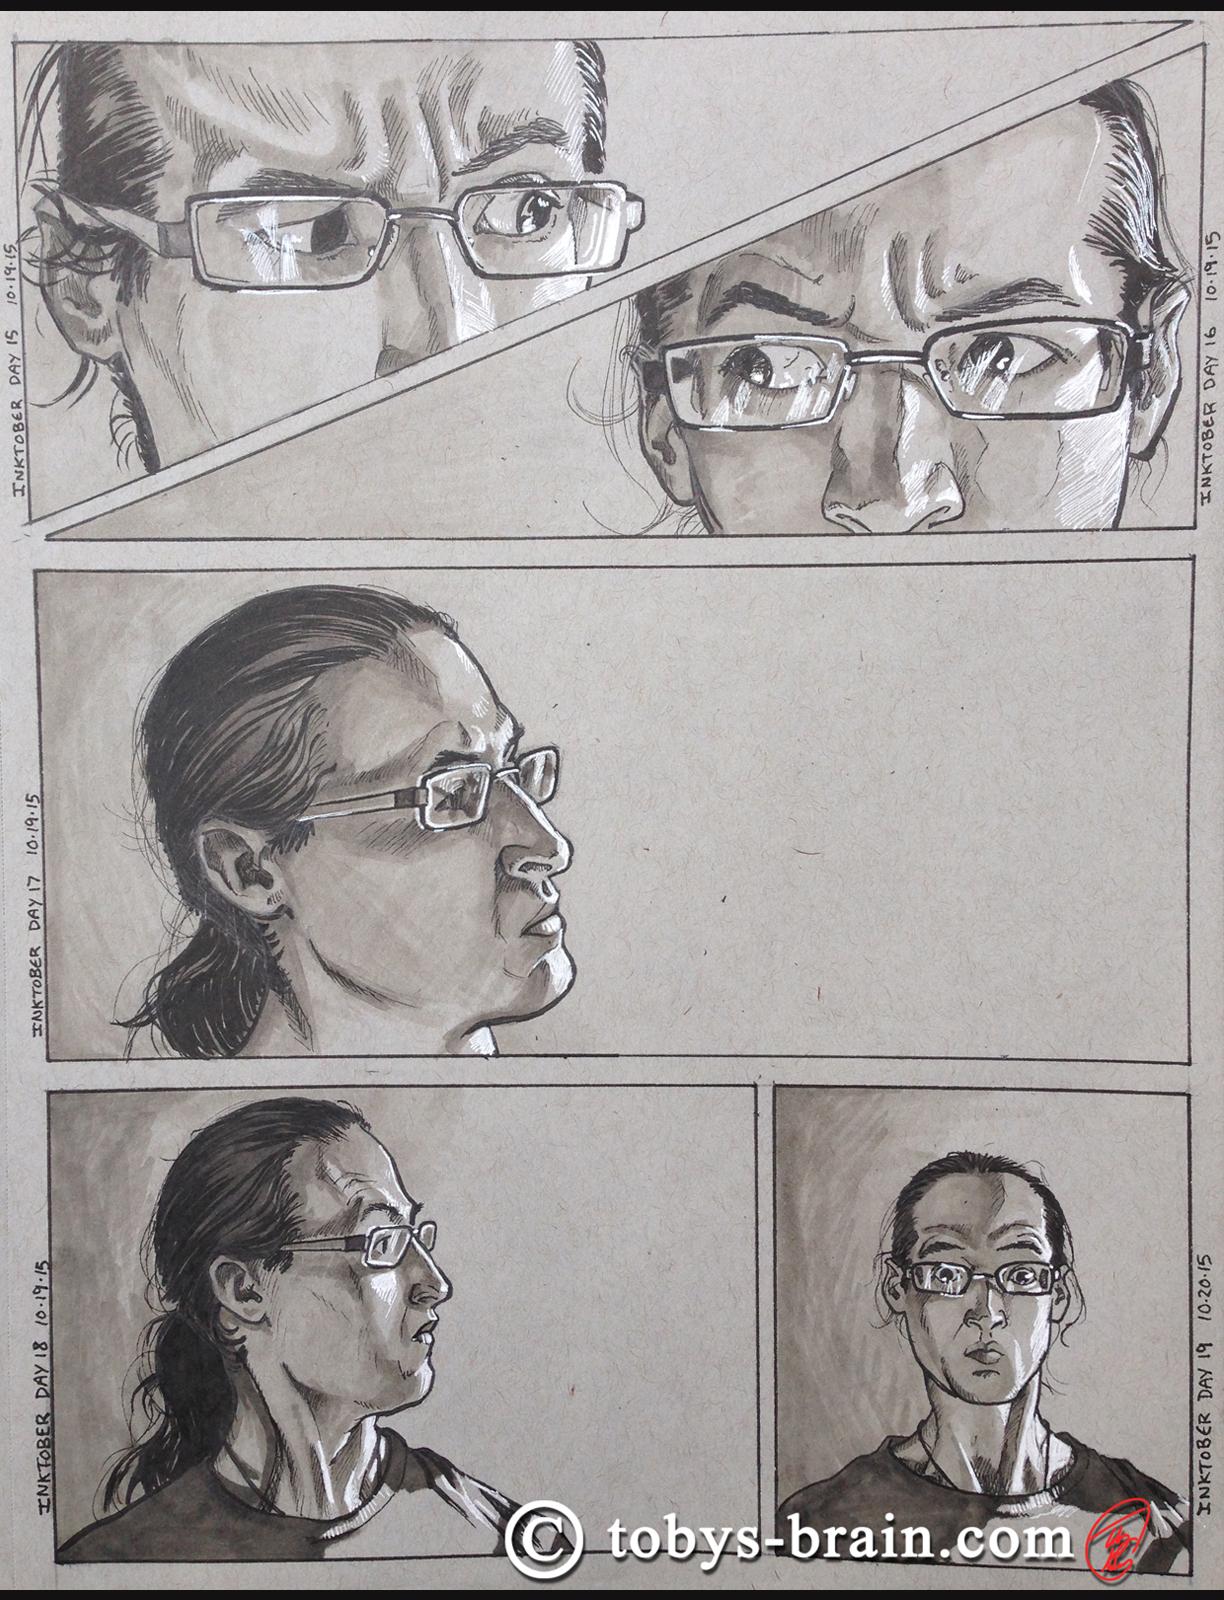 ink self-portrait series for October/Inktober 2015